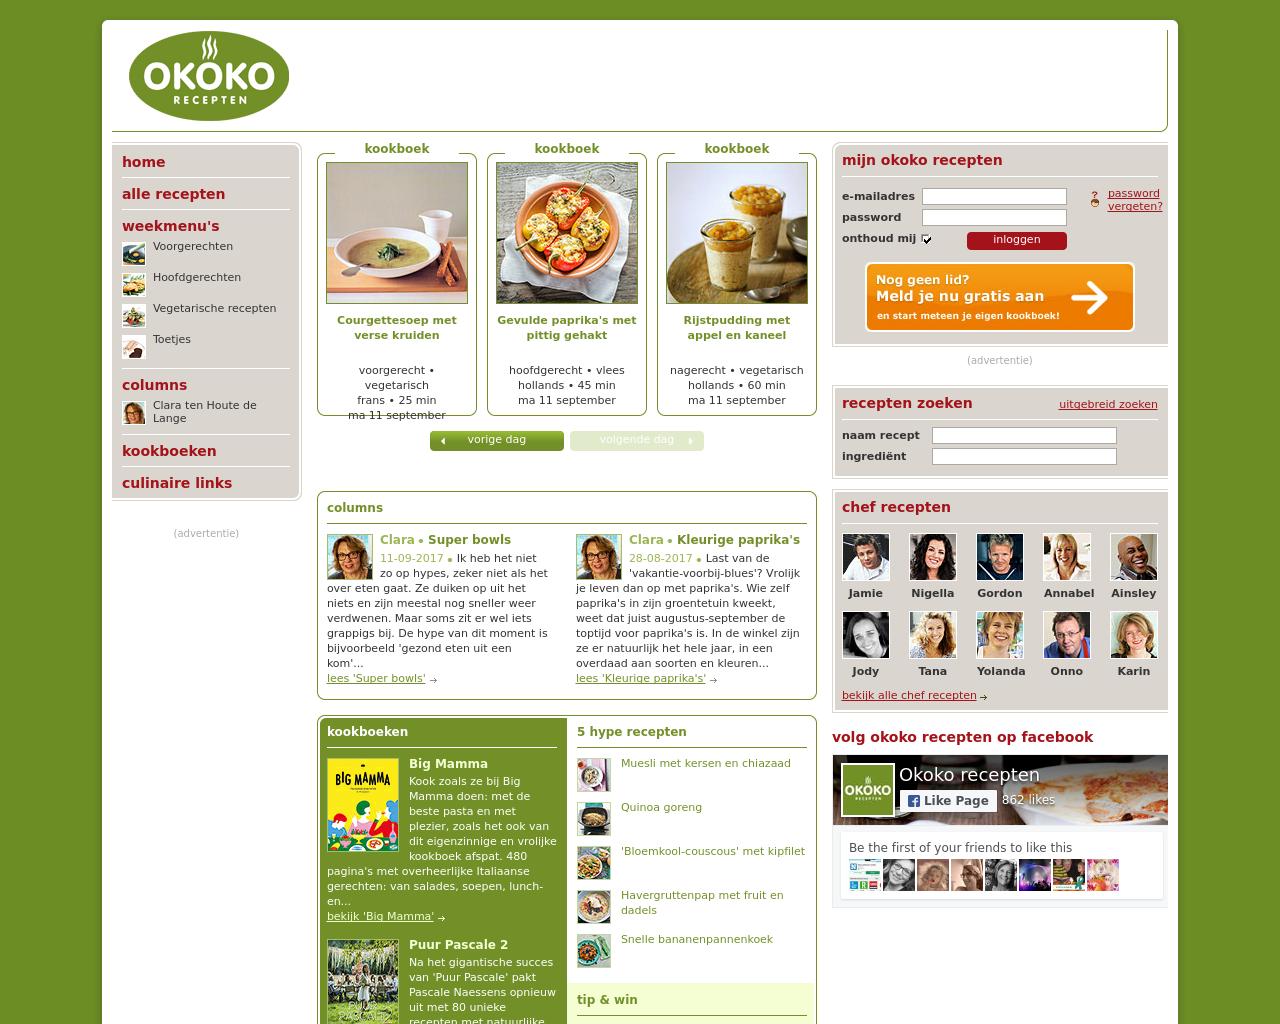 Okoko-Recepten-Advertising-Reviews-Pricing